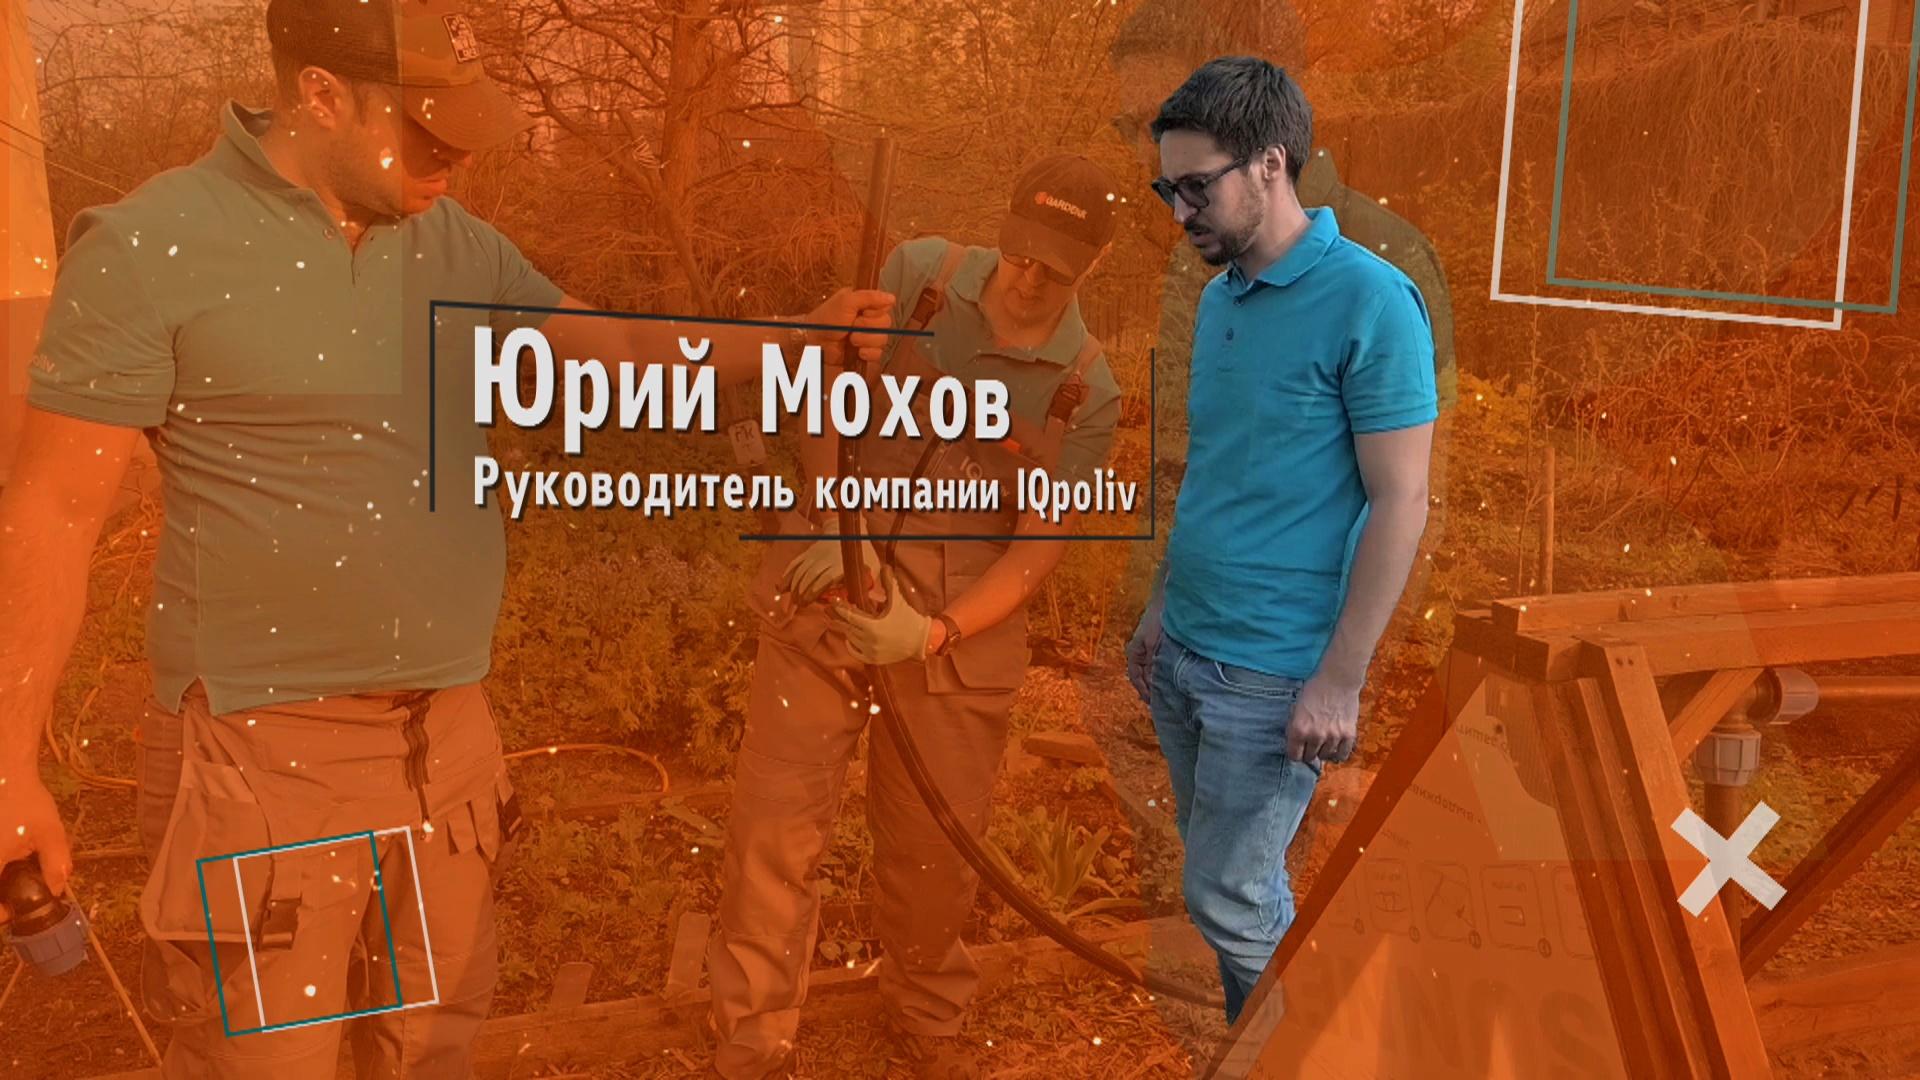 Монтаж ролика про команду IQpoliv